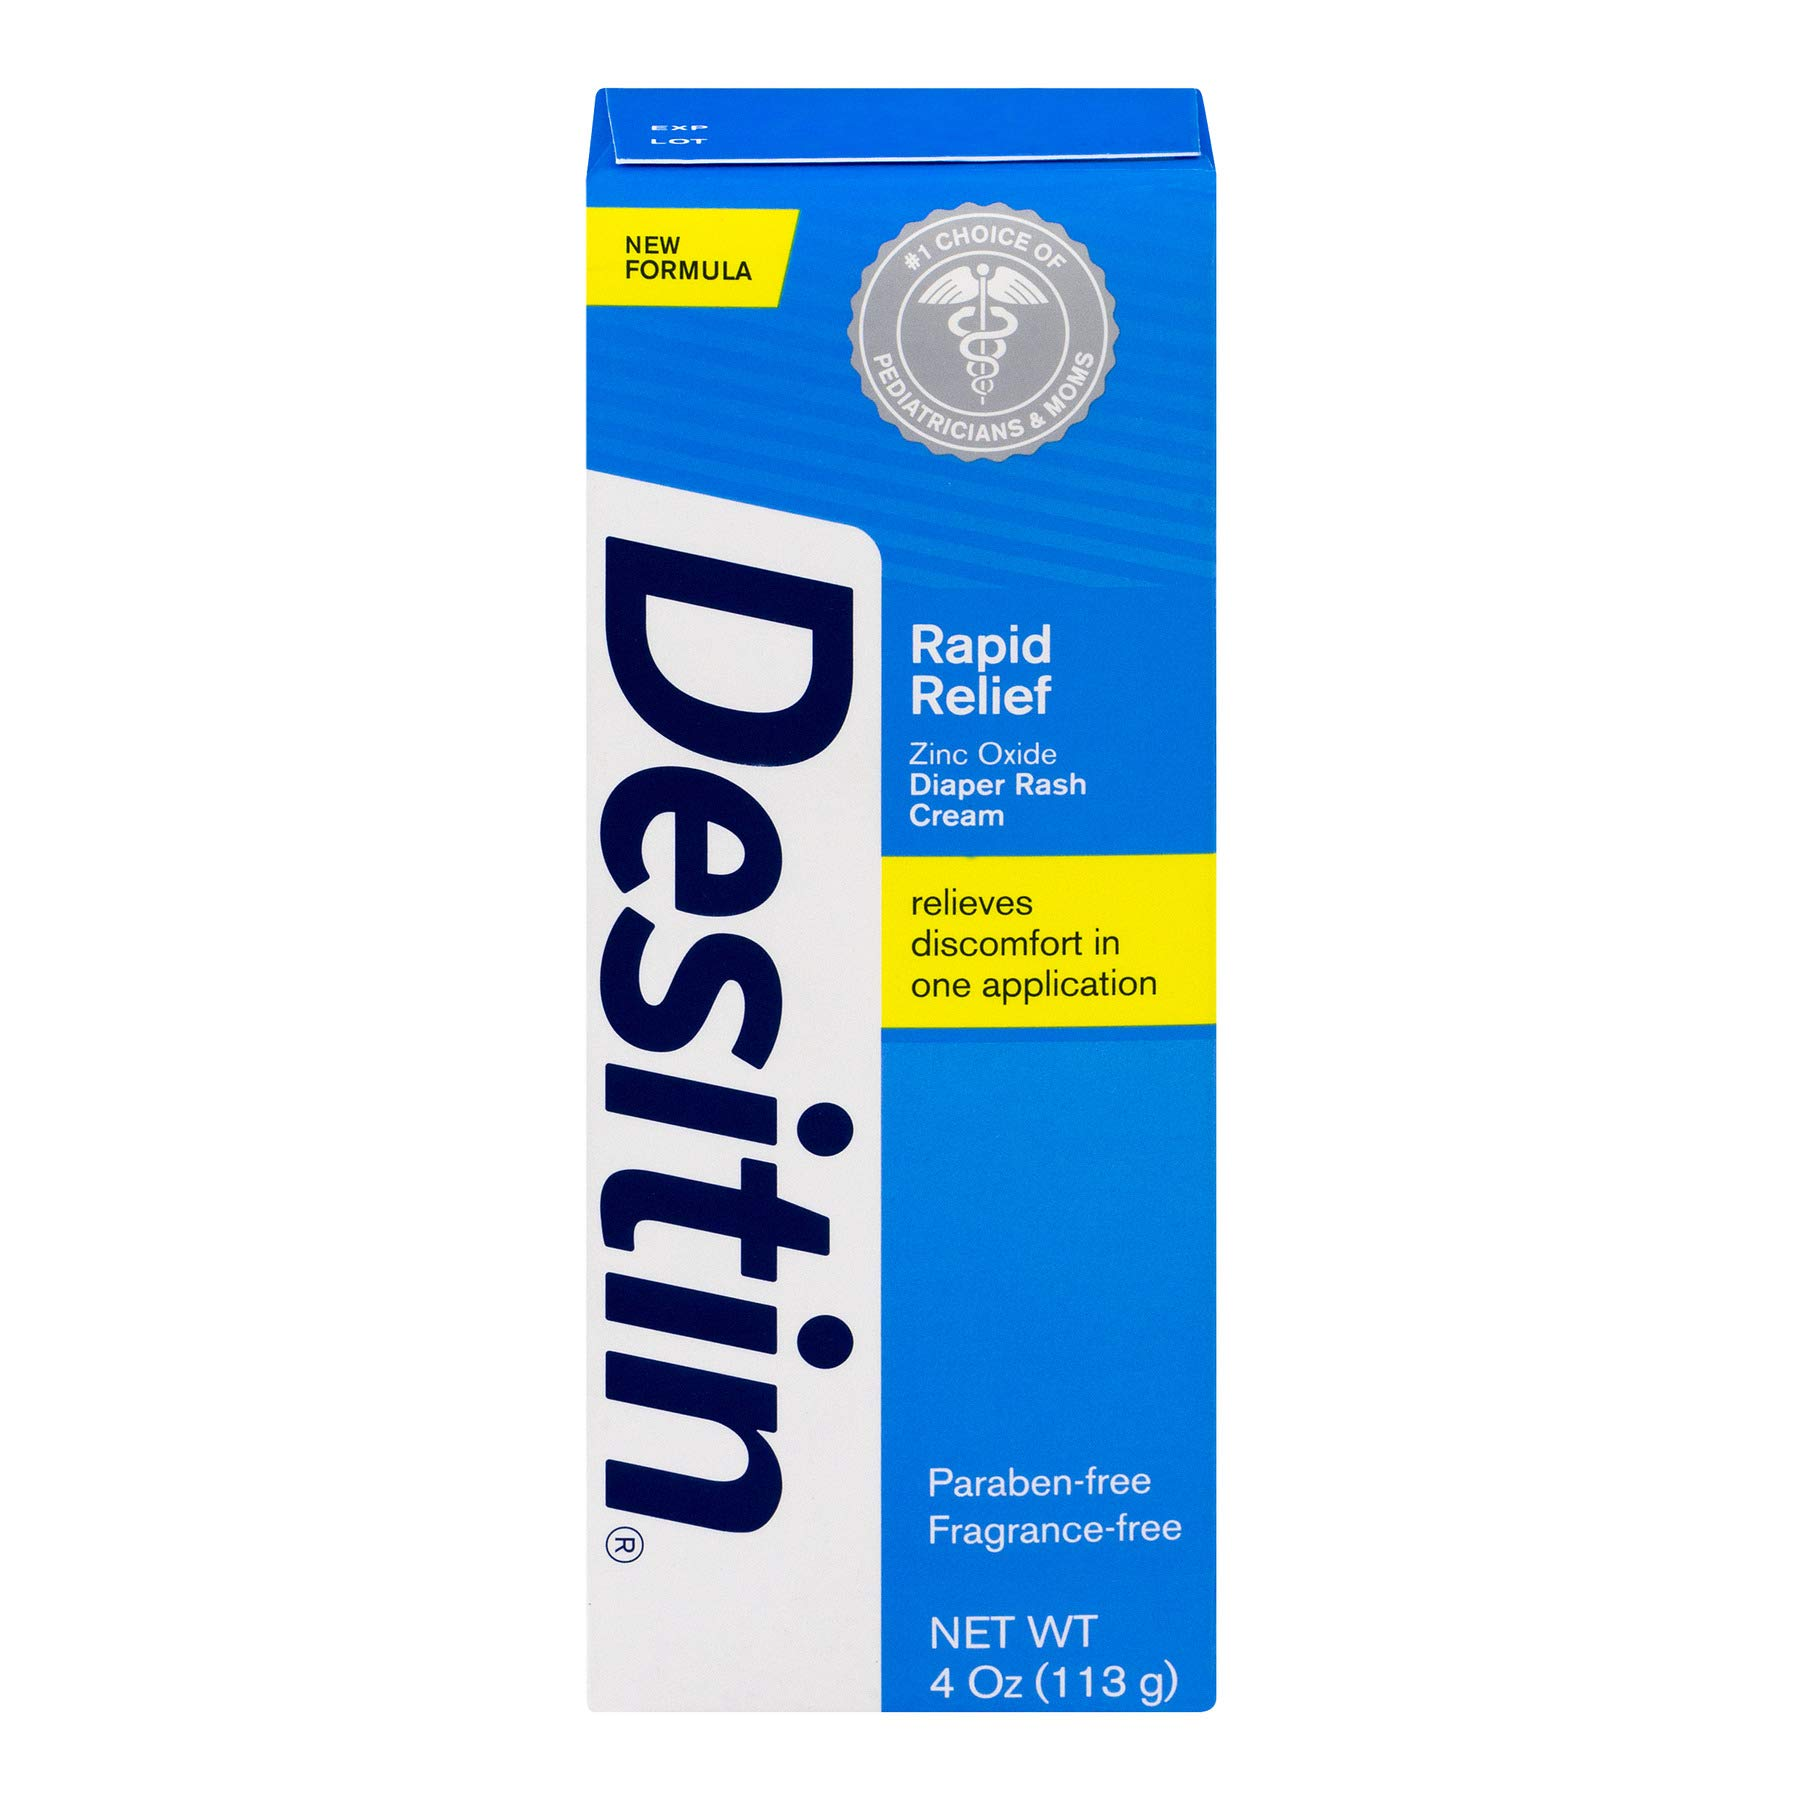 DESITIN Rapid Relief Zinc Oxide Diaper Rash Cream 4 oz ( Pack of 9)